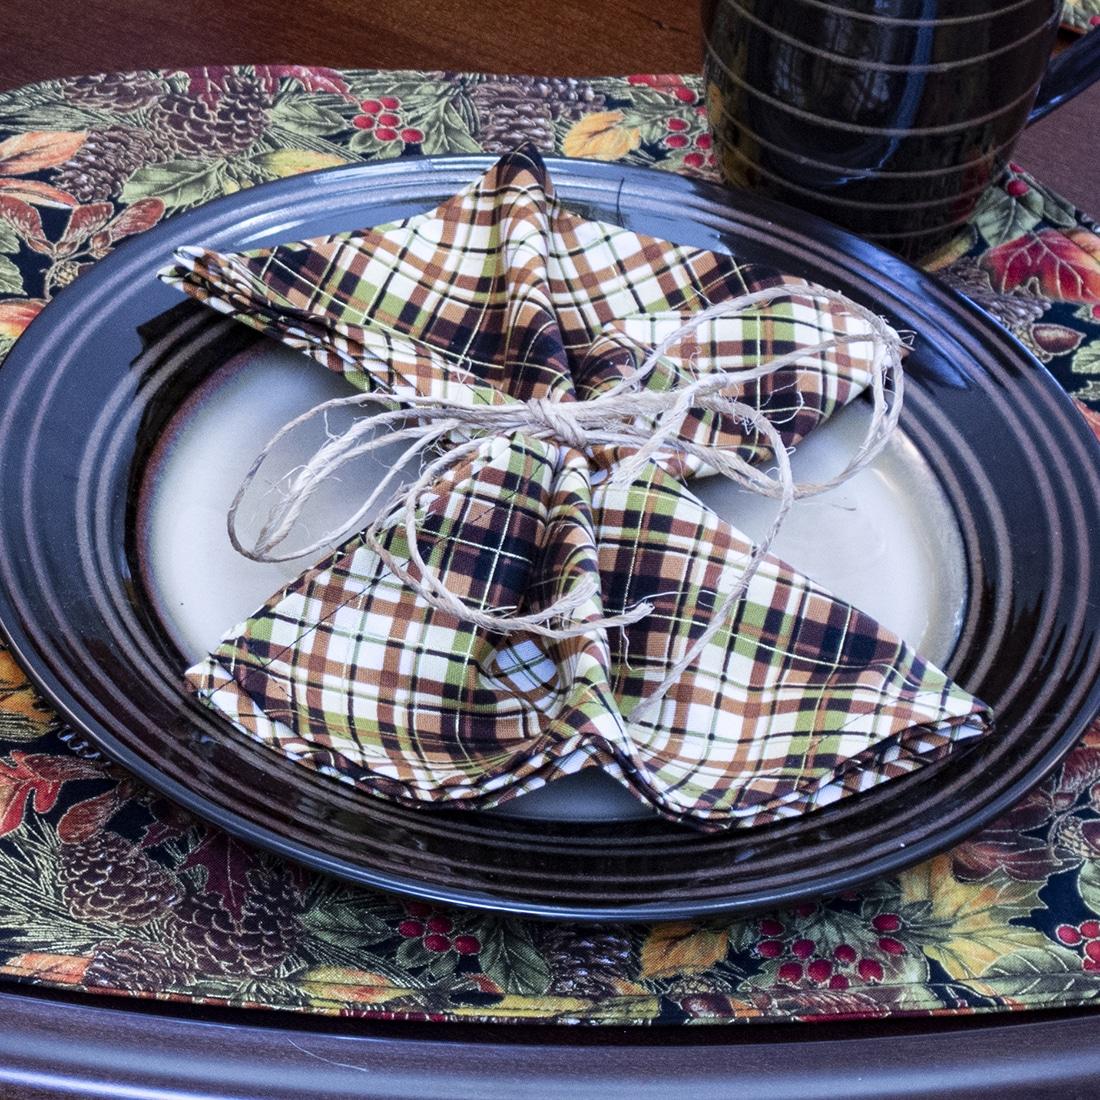 Sweet Pea Linens - Fall Plaid Cloth Napkin (SKU#: R-1010-Z41) - Table Setting